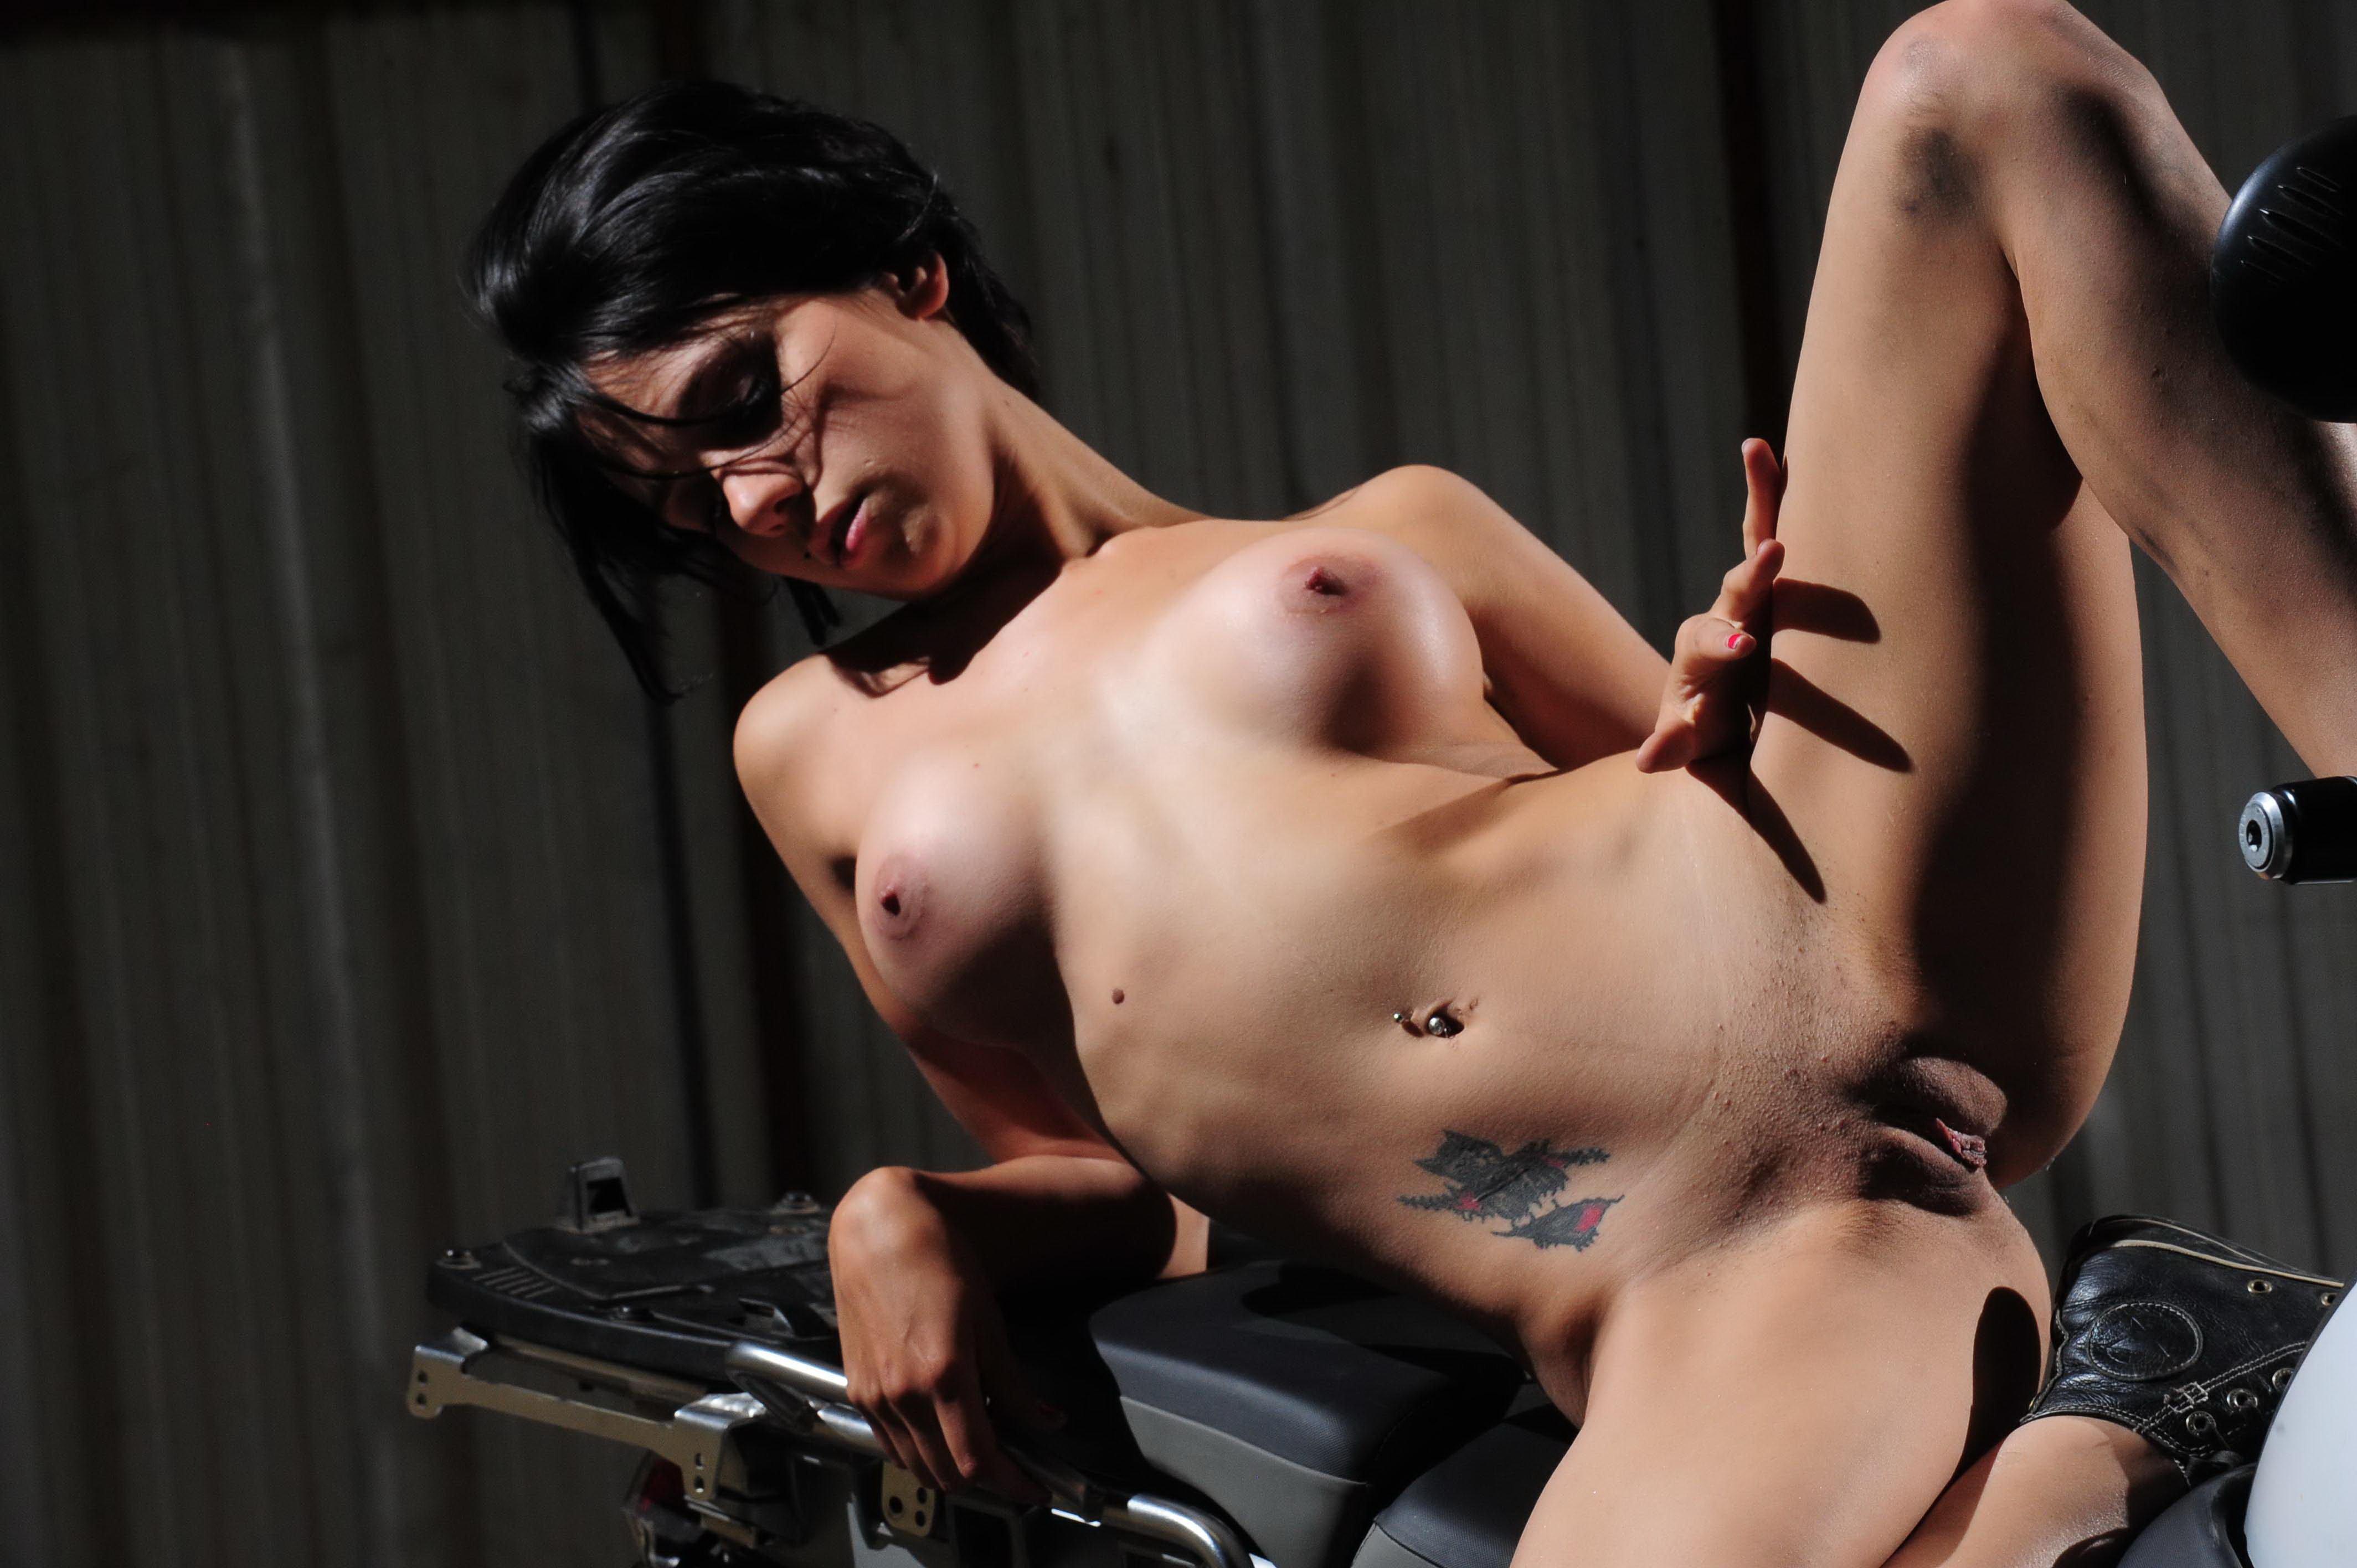 Jenna jameson masturbation video